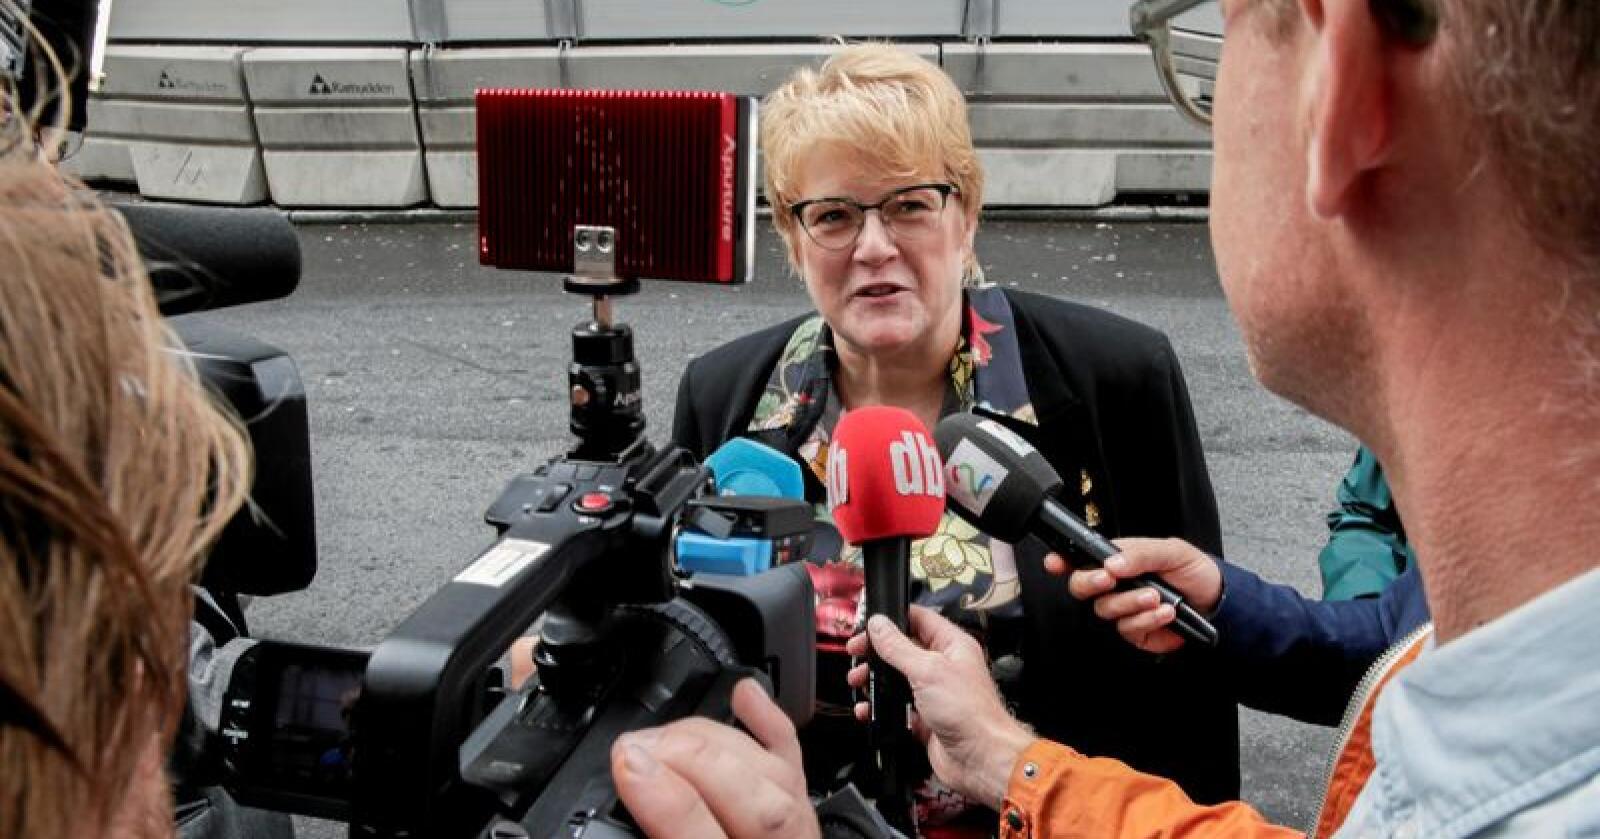 Leder i Venstre, Trine Skei Grande, møter her pressen før sentralstyremøtet etter valget. Foto: Vidar Ruud / NTB scanpix